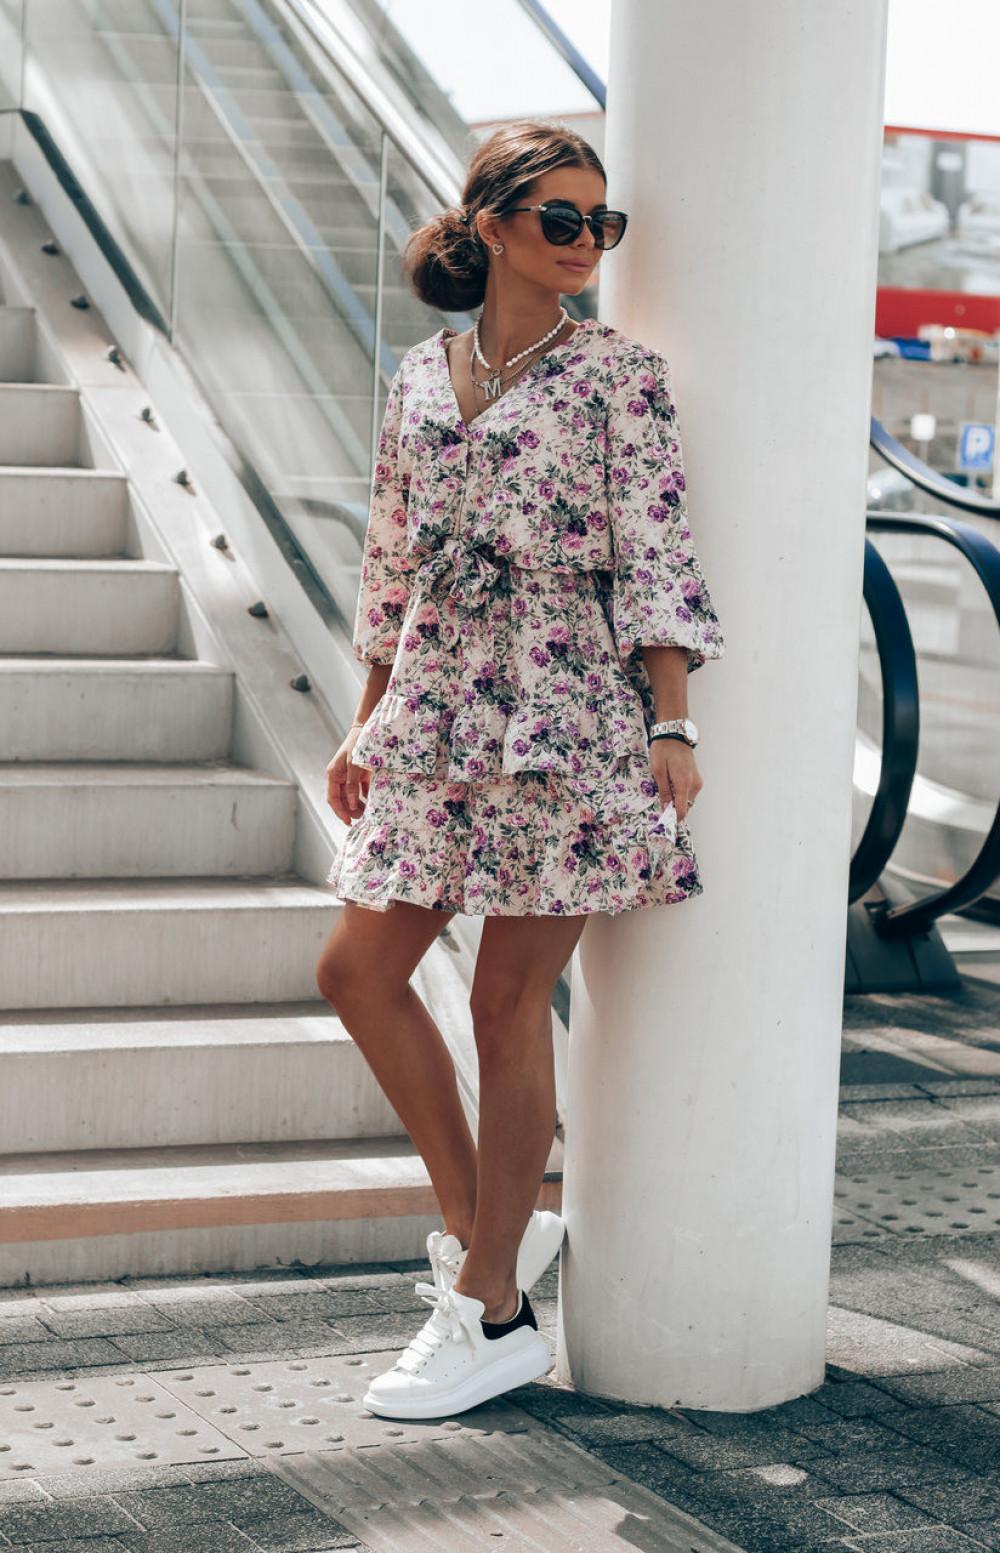 Fioletowa sukienka kwiatowa rozkloszowana z falbankami Abella 2